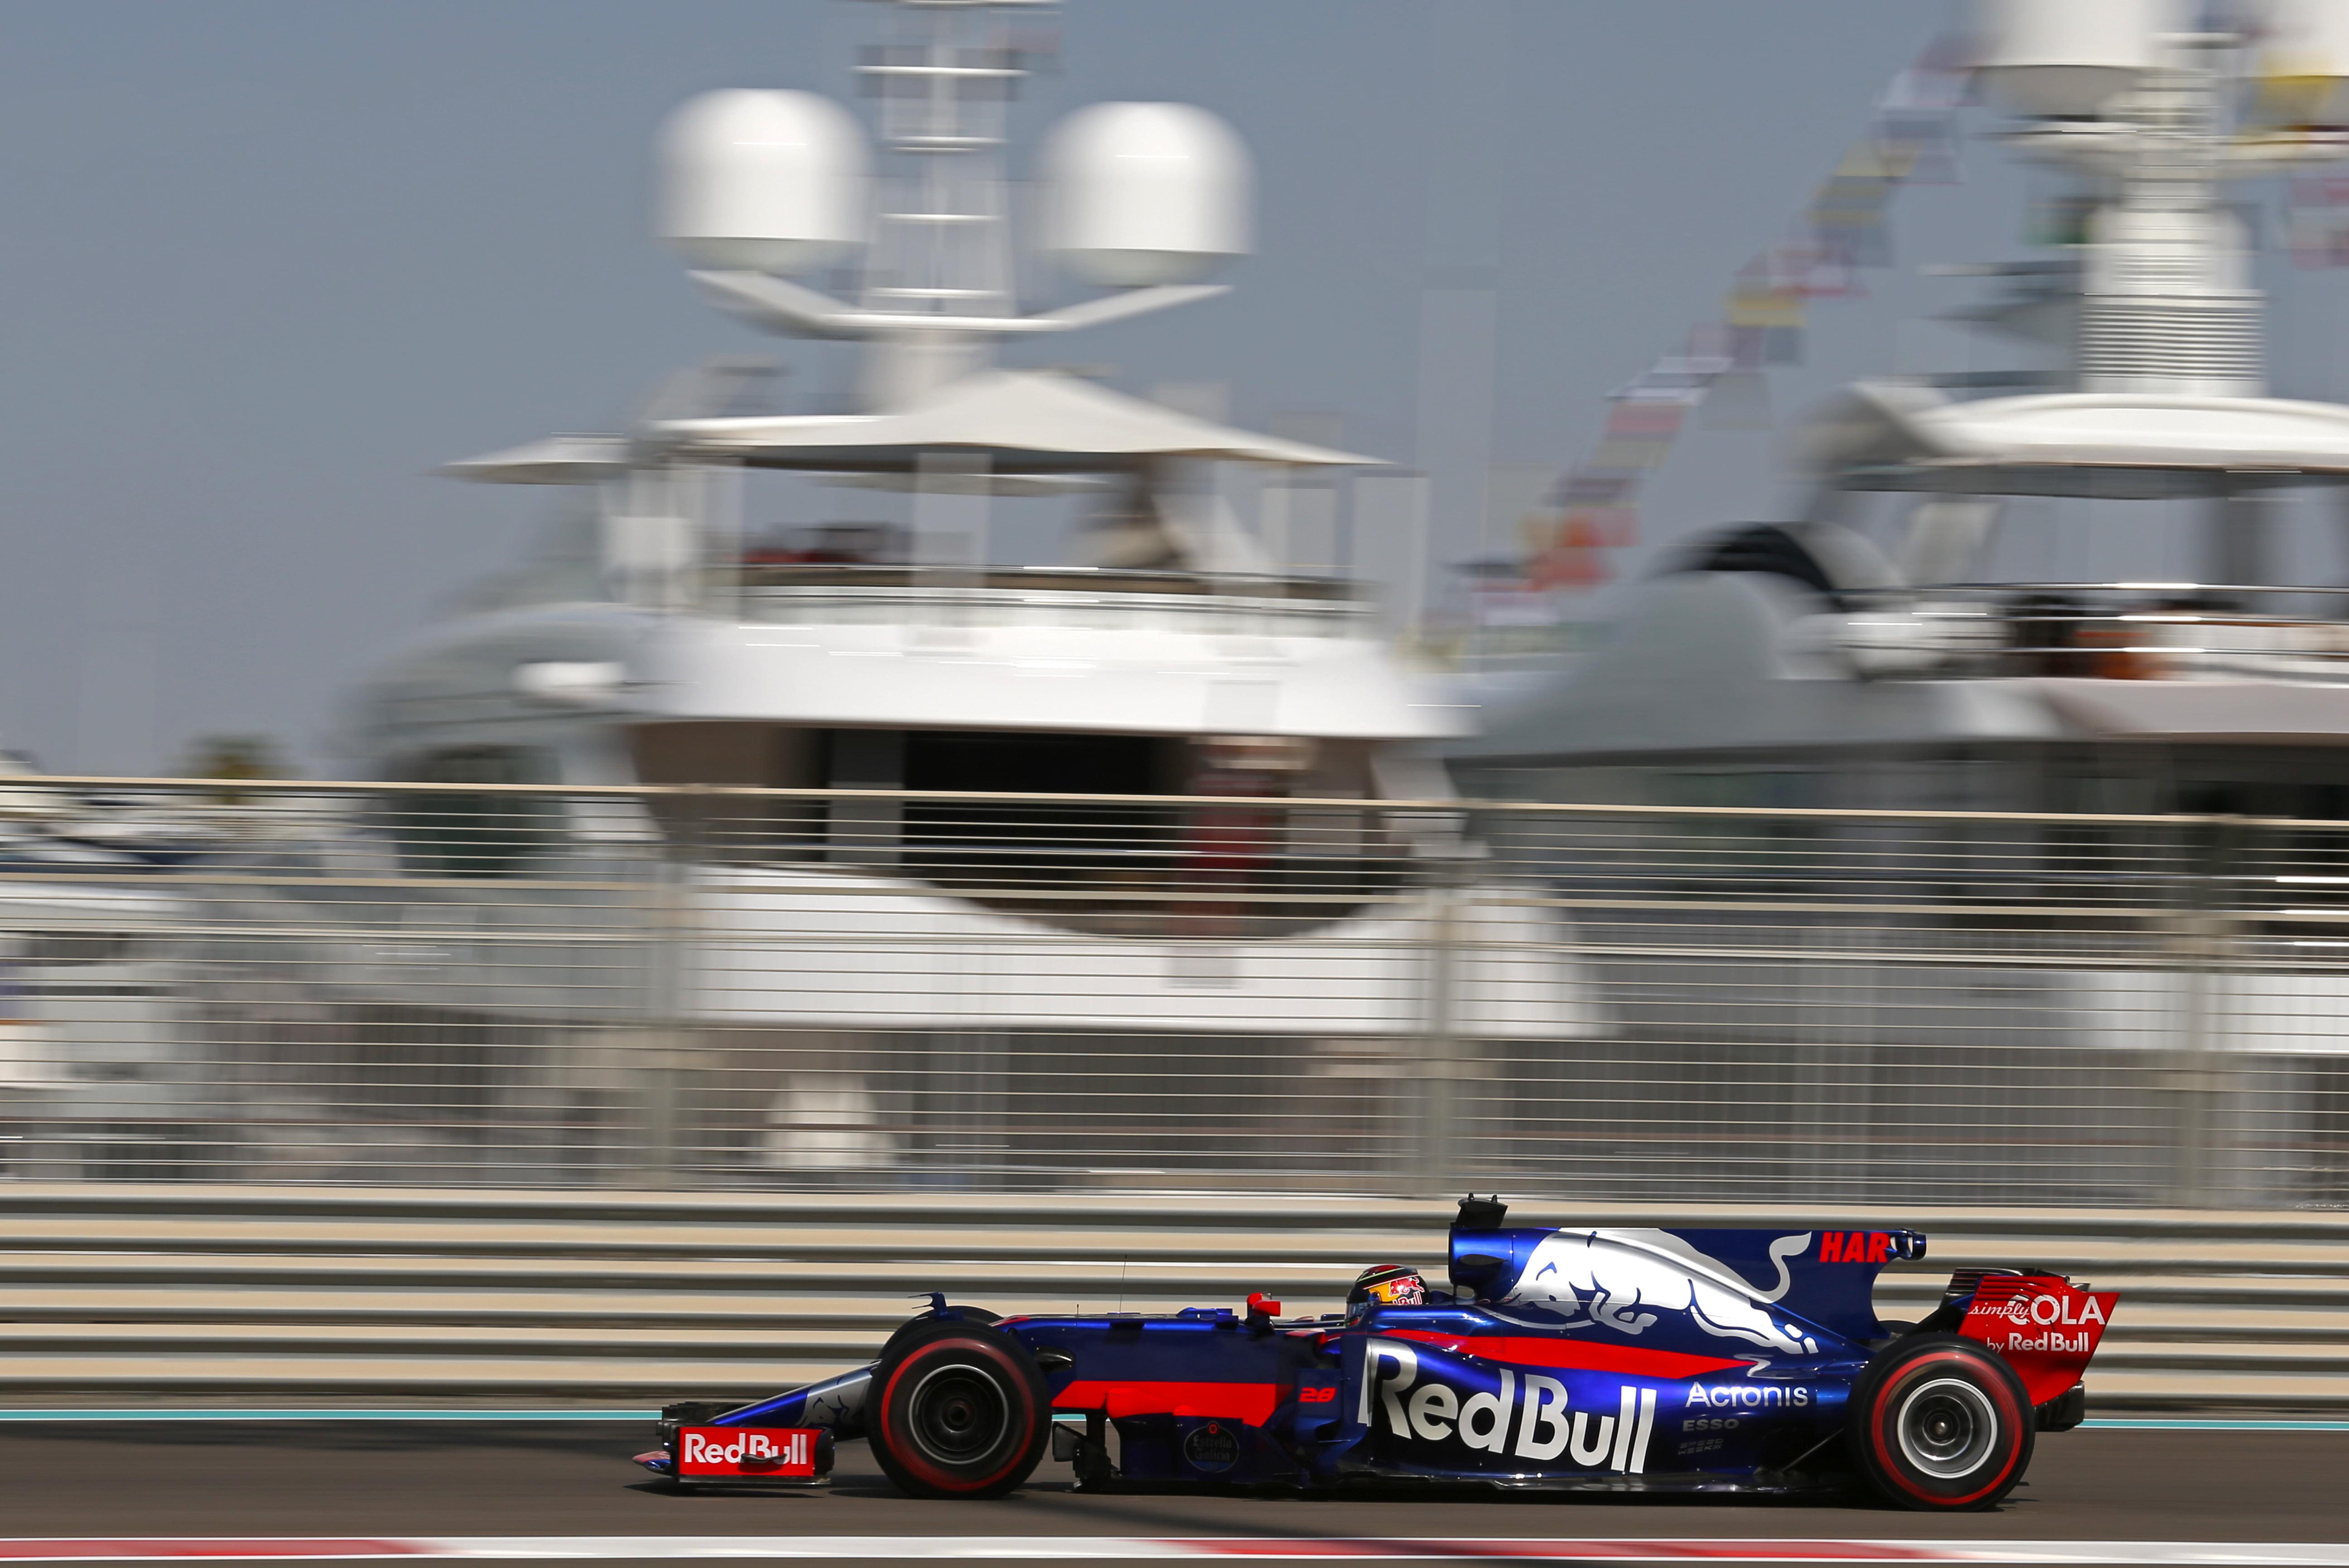 Formula One World Championship 2017, Round 20, Abu Dhabi Grand Prix, Abu Dhabi, United Arab Emirates, Friday 24 November 2017 – Brendon Hartley (NZ), Scuderia Toro Rosso